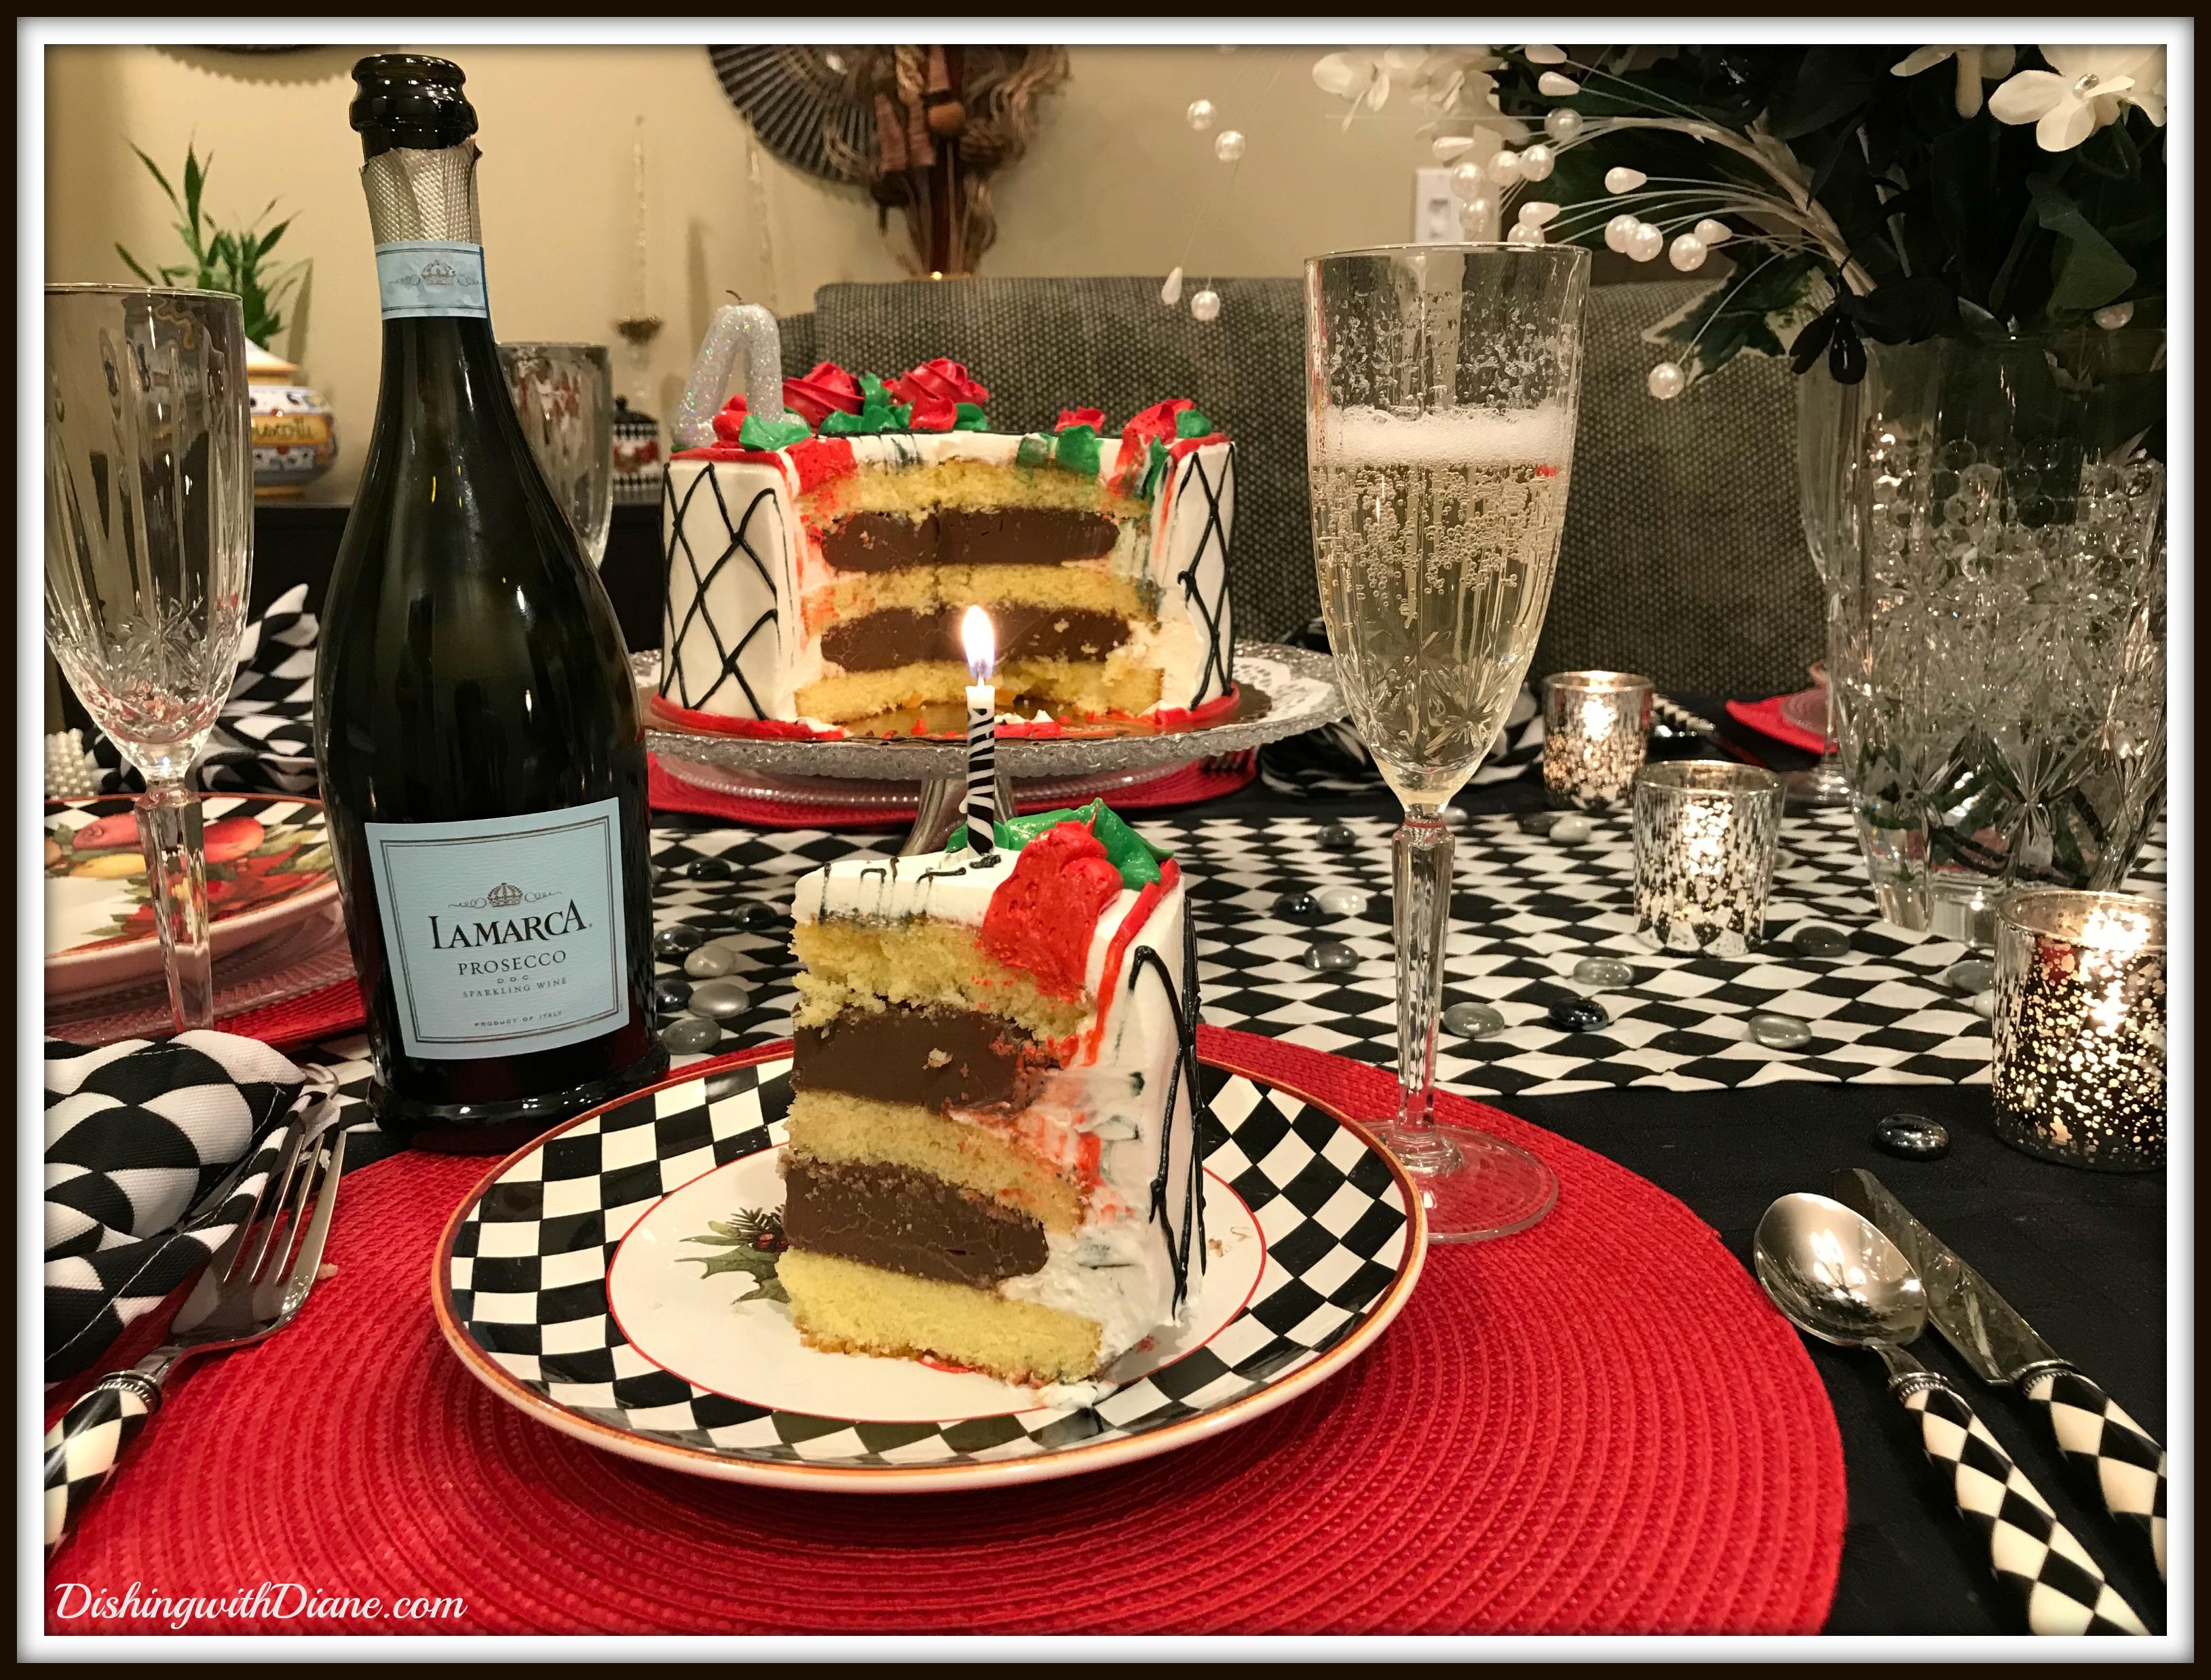 photo jan 26, 1 26 24 am cake and toast